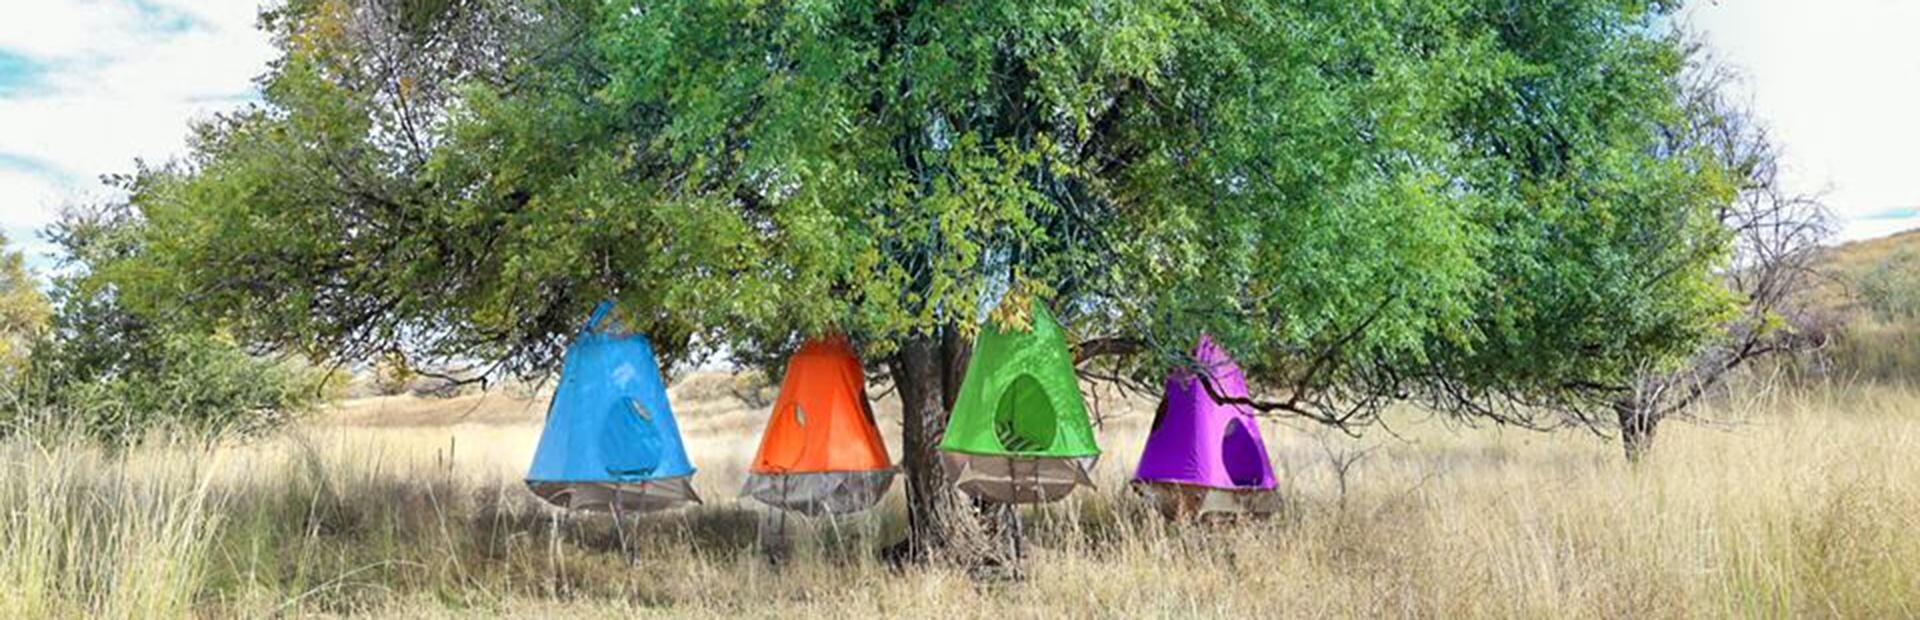 TreePods_Hanging_from_Tree_Slider.jpg